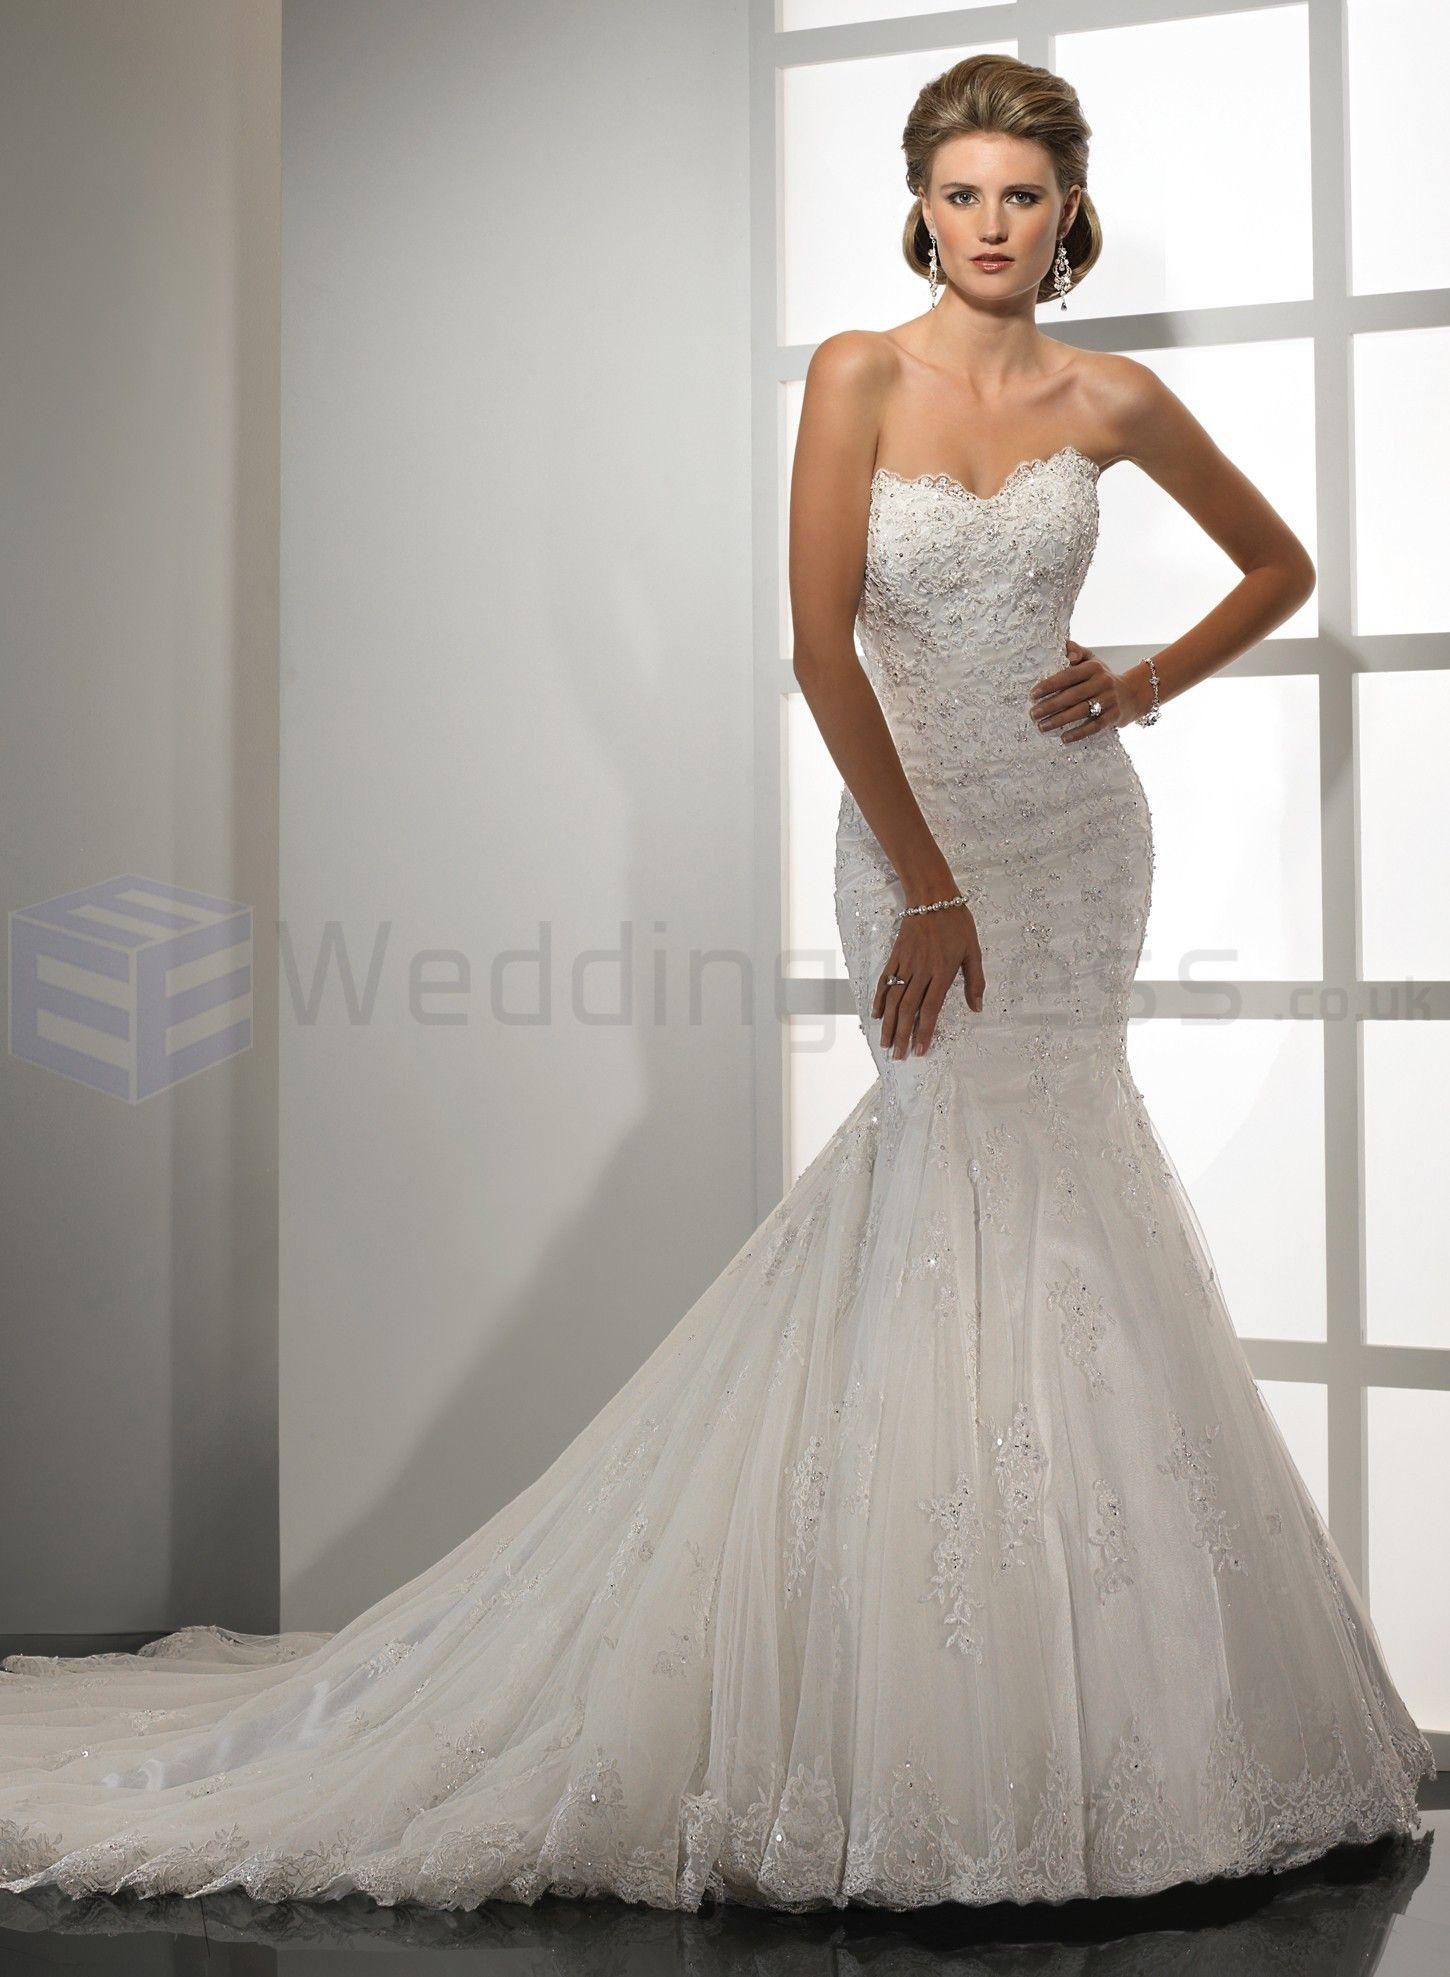 lace backless wedding dress Splendid Embellished Lace and Tulle Sweetheart Neckline Mermaid Wedding Dress